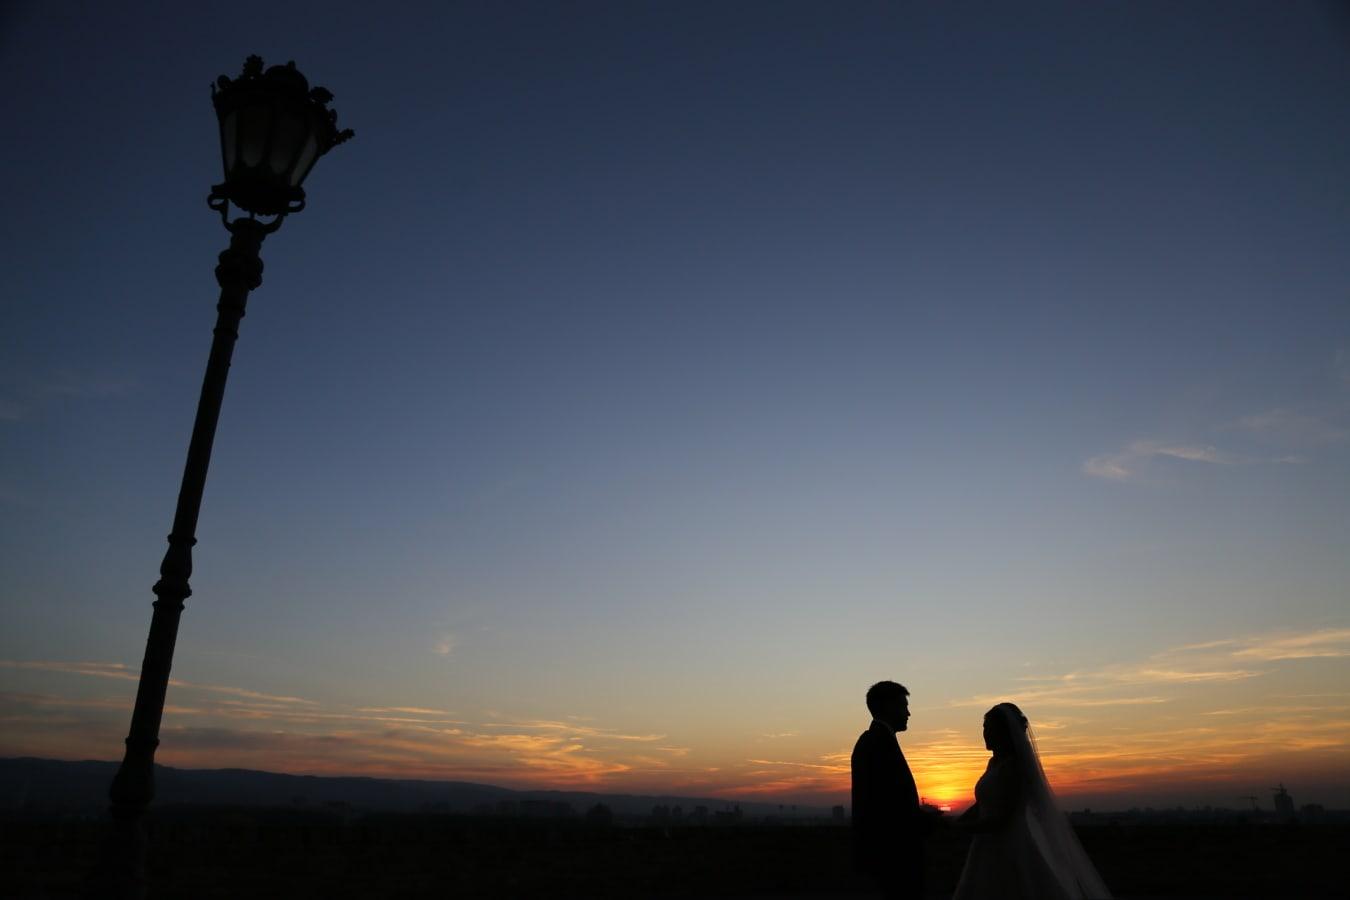 evening, romantic, sunset, woman, man, togetherness, standing, silhouette, sunrise, lighting